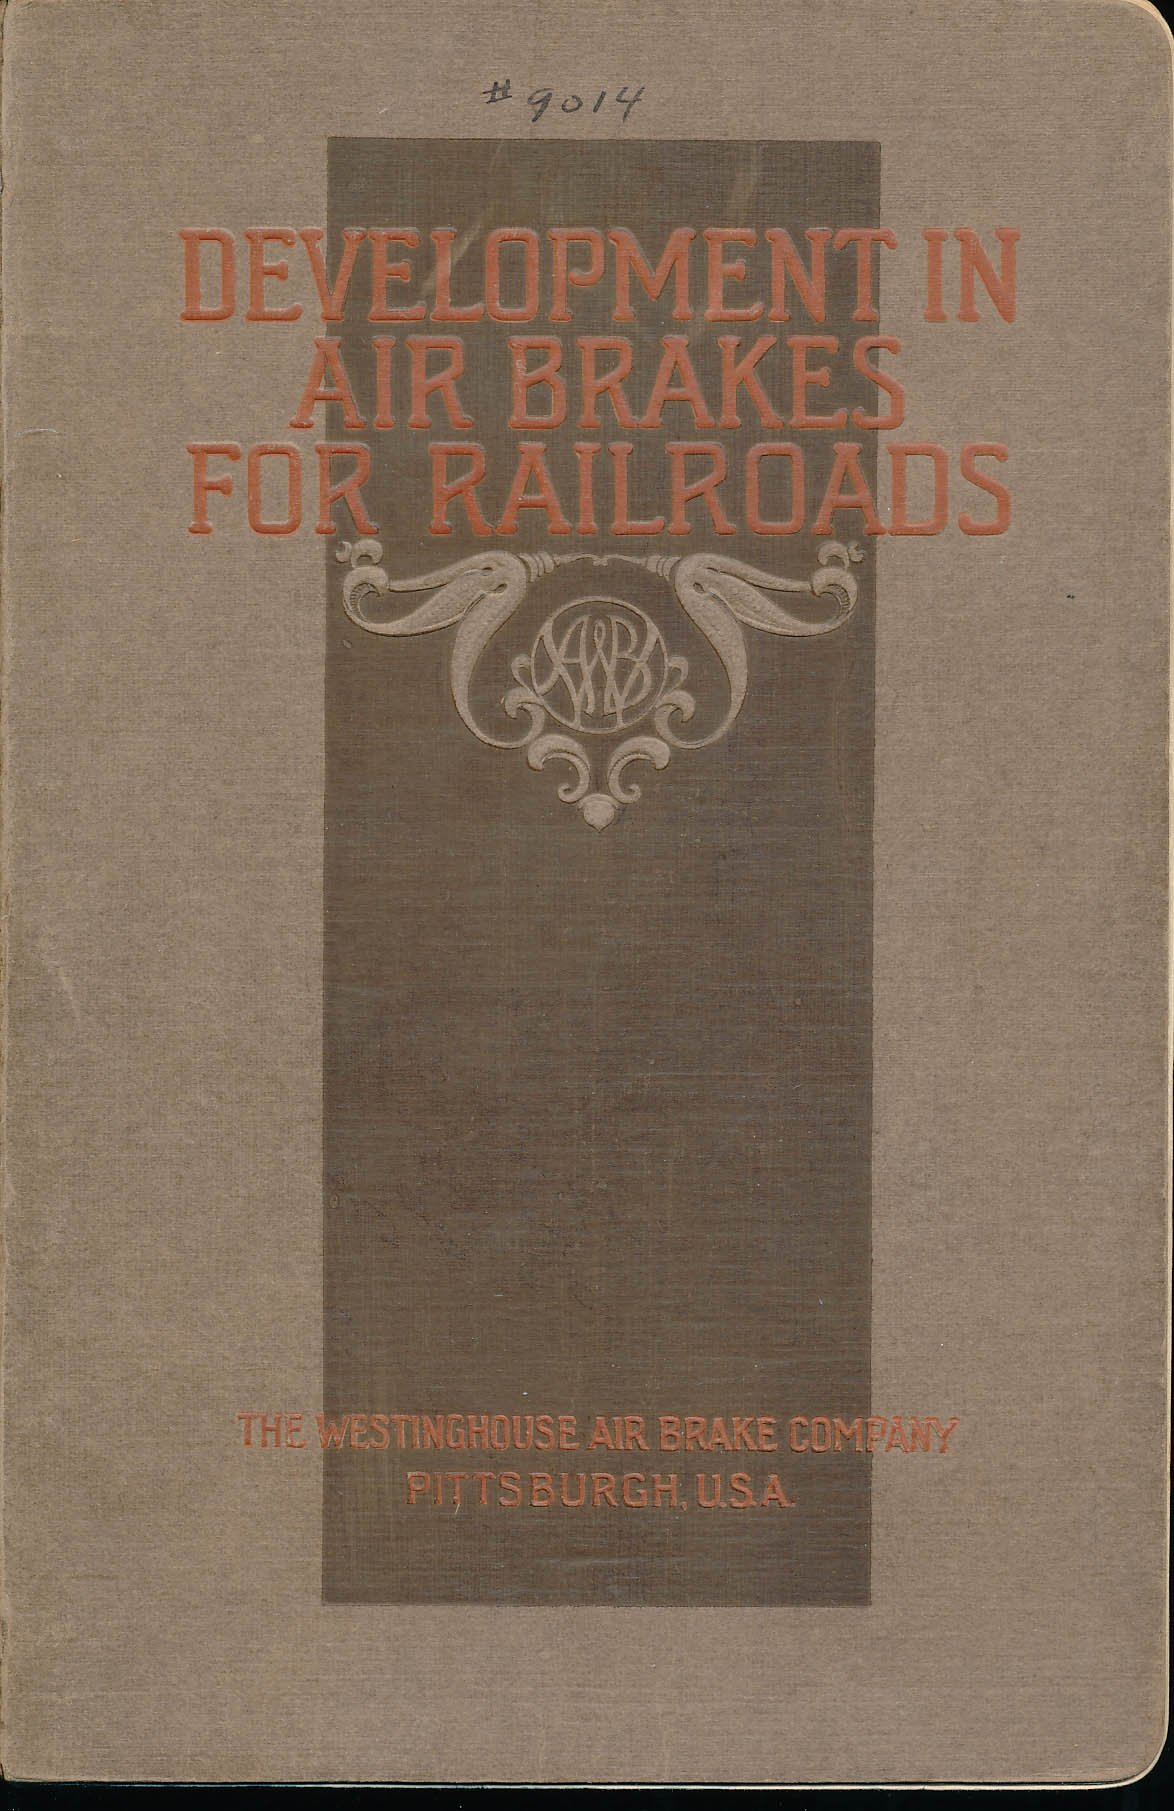 DEVELOPMENT IN AIR BRAKES FOR RAILROADS